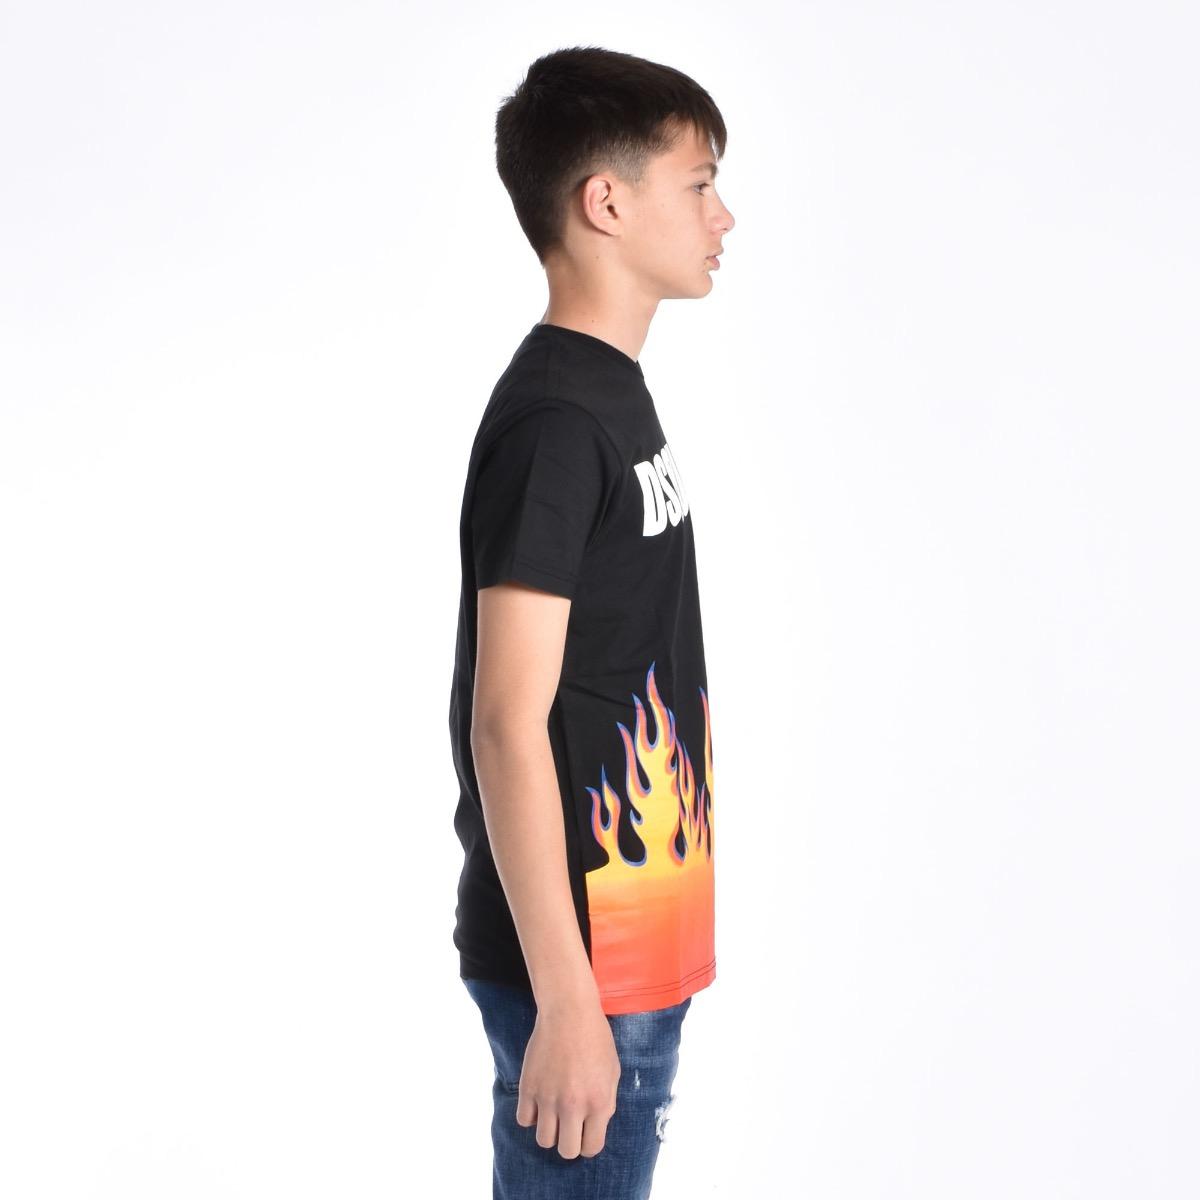 T-shirt con fiamme - Nera